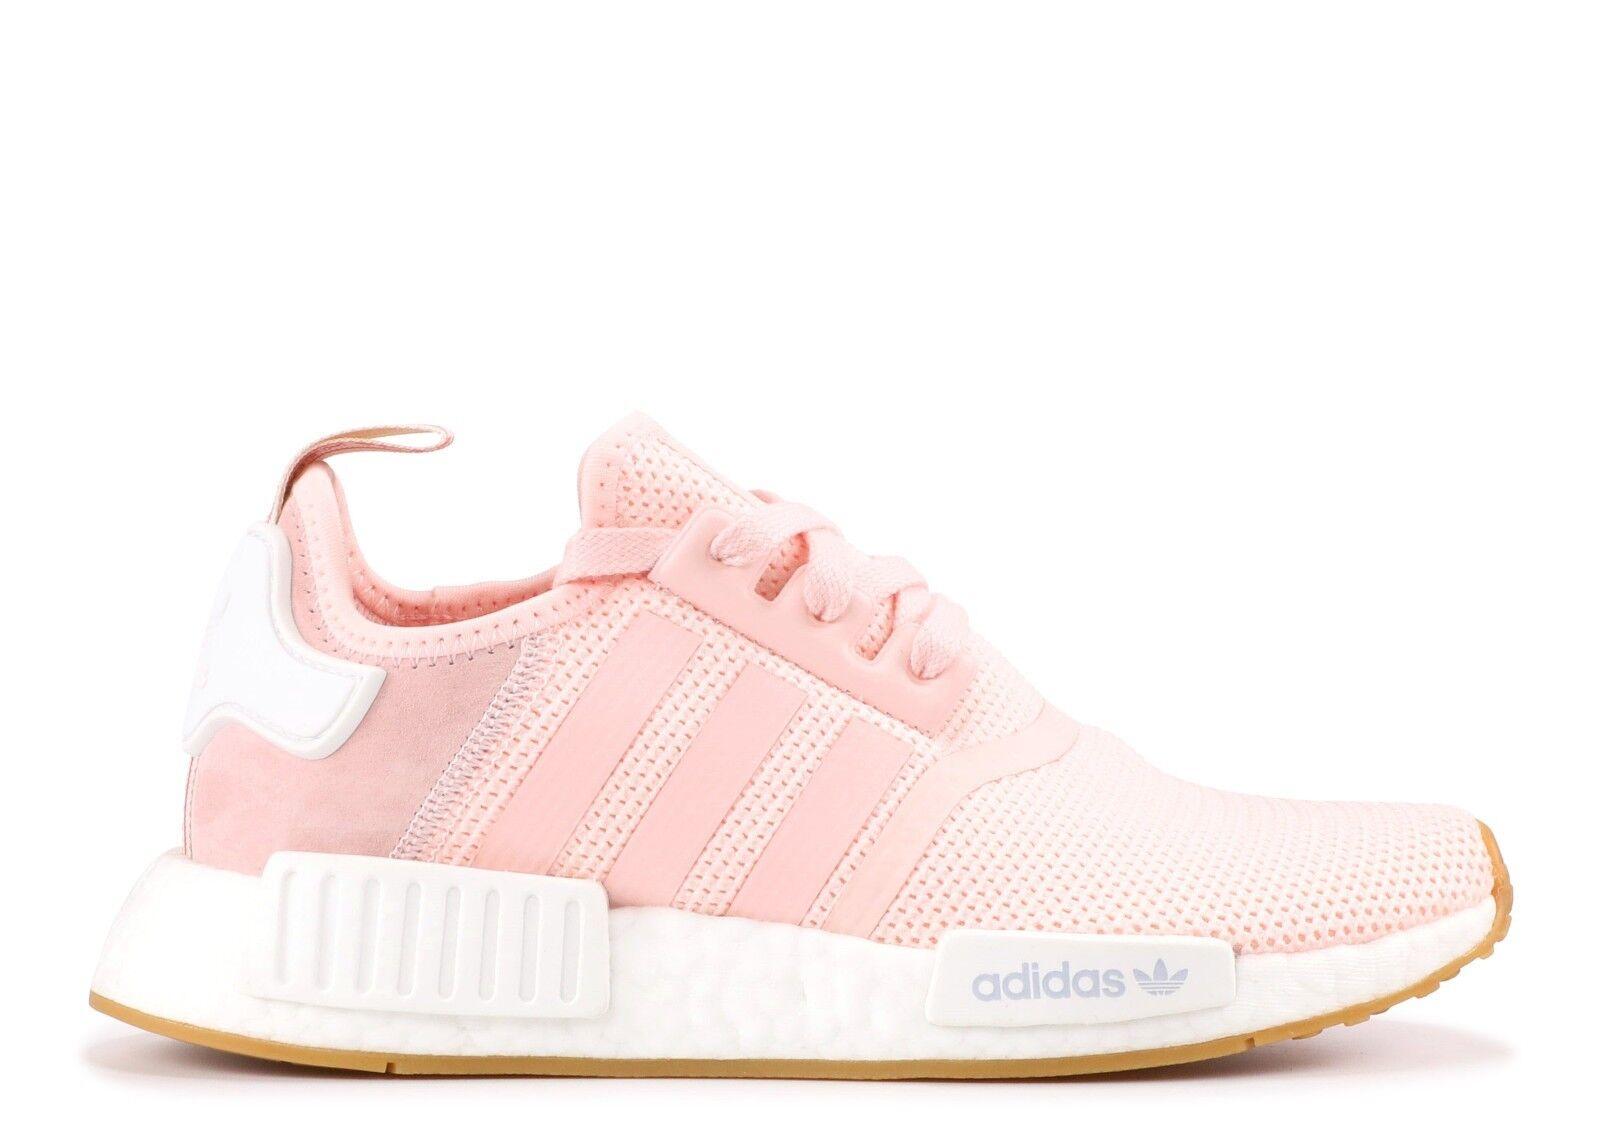 Adidas NMD R1 Women's US 8 Pink Pink Pink White Gum BB7588 78caef